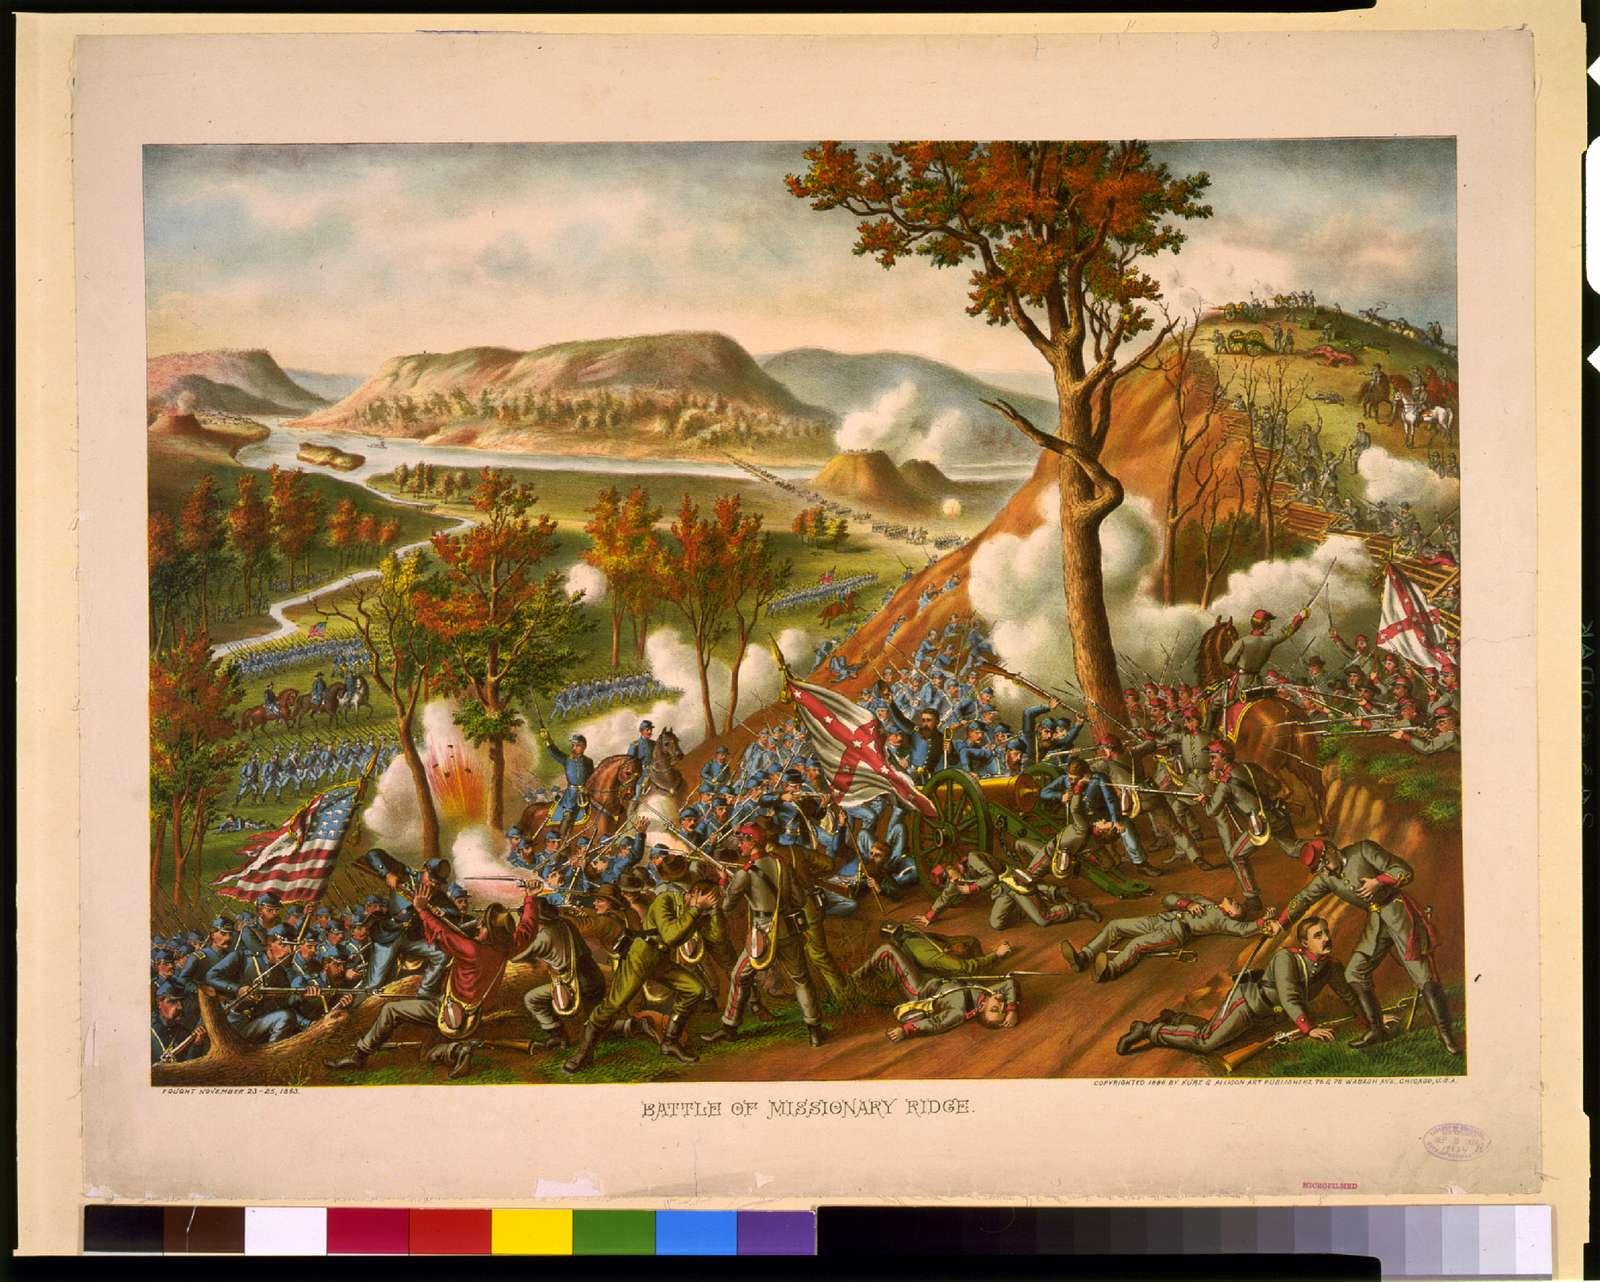 Battle of Missionary Ridge - fought November 23-25, 1863